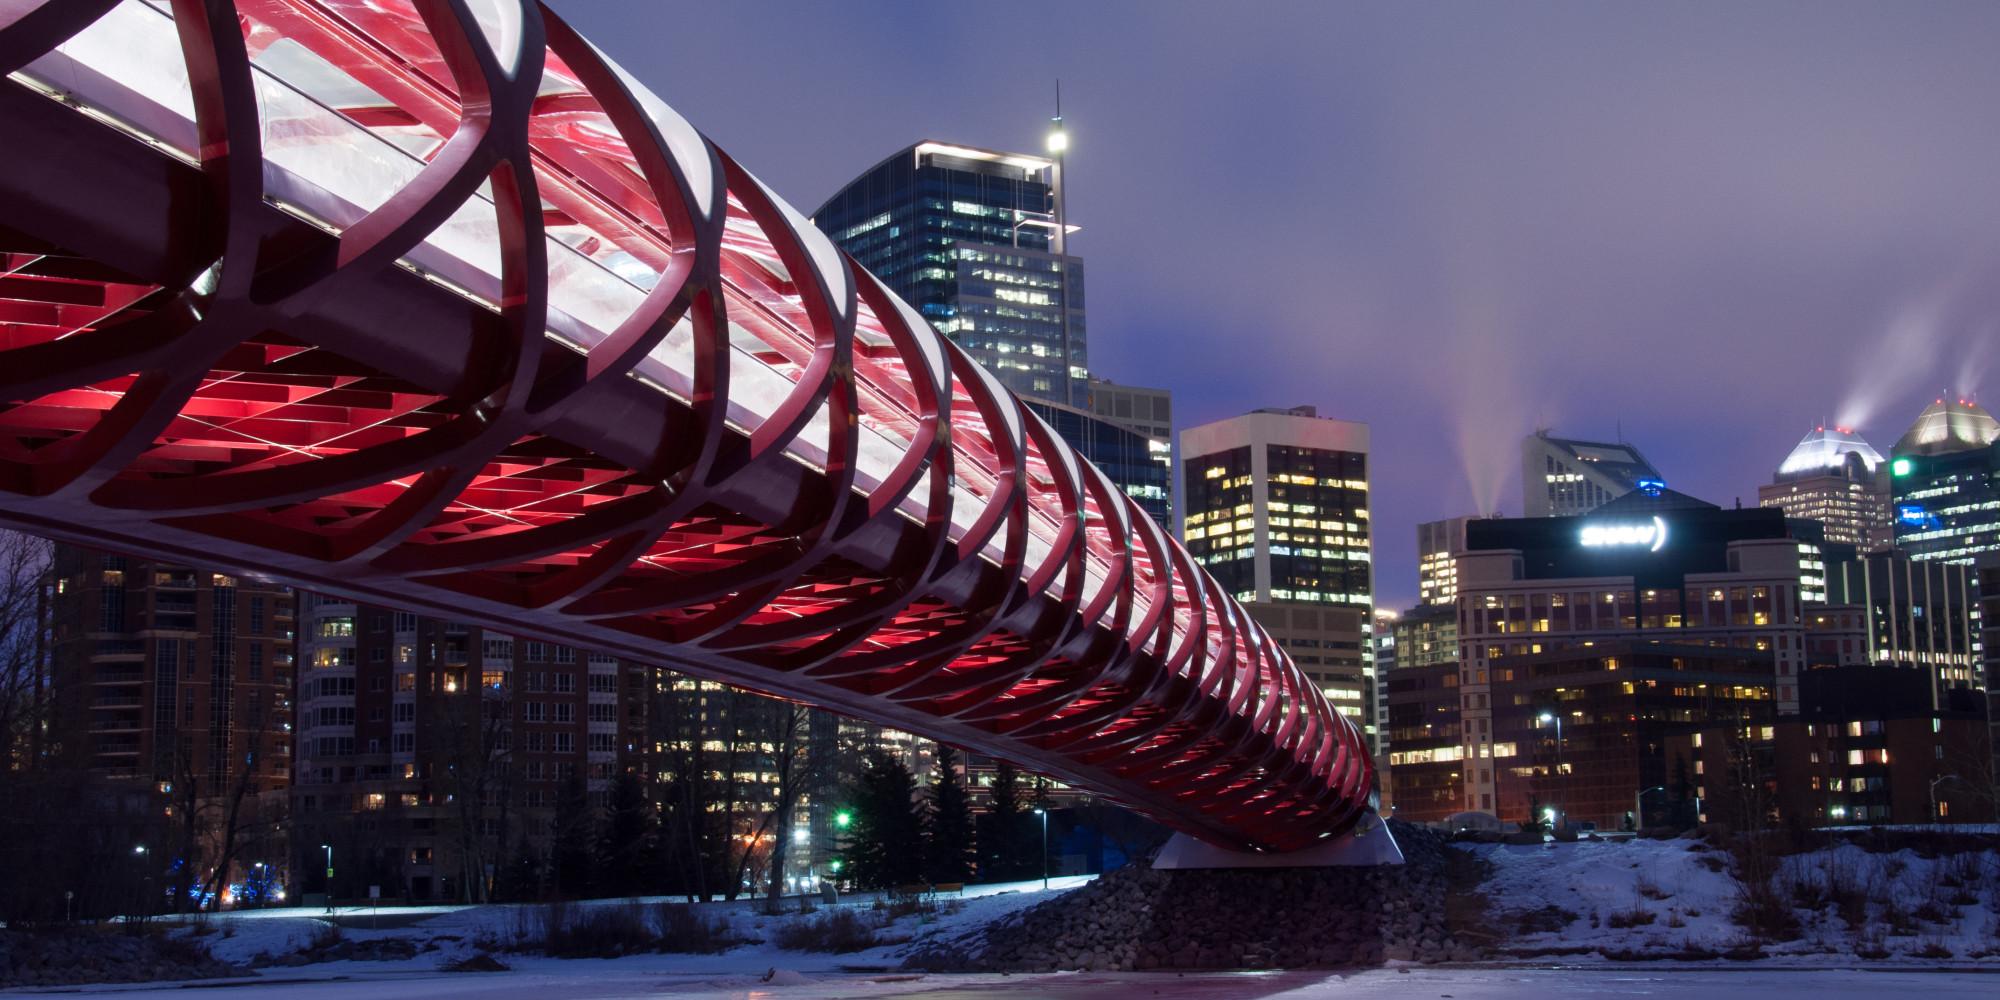 Calgary Peace Bridge Made Of Candy On Display At City Hall